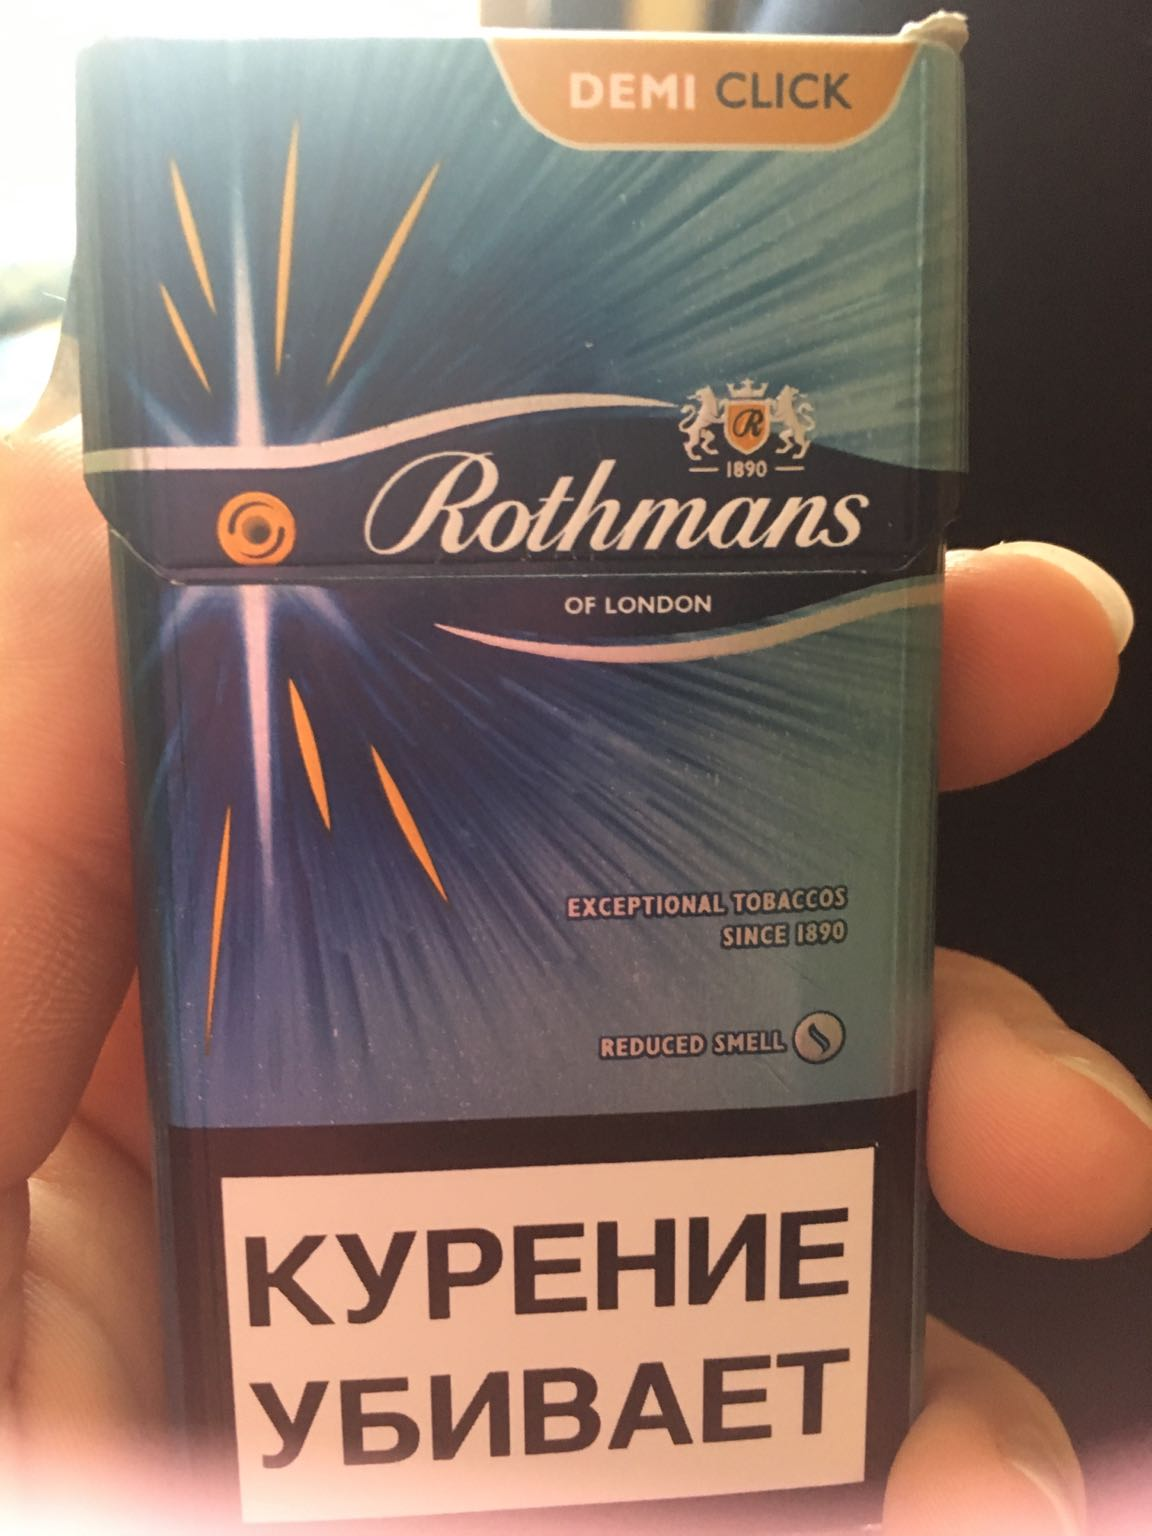 Сигареты Ротманс с кнопкой